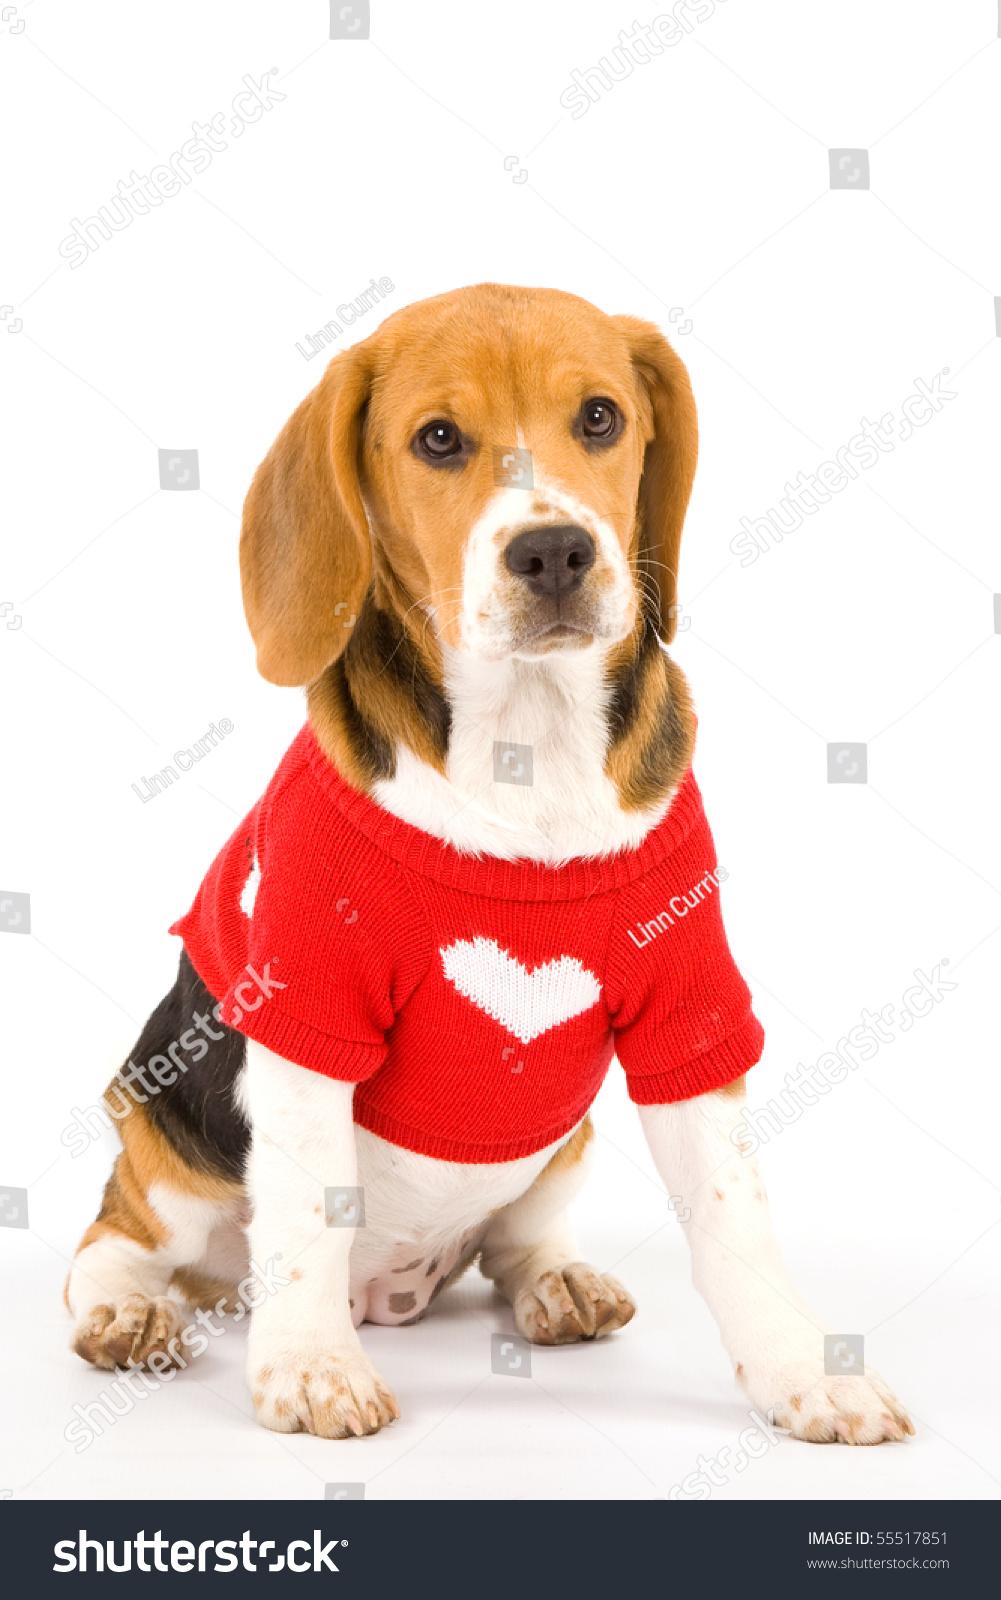 Sad Beagle Puppy Red Sweater On Stock Photo Edit Now 55517851